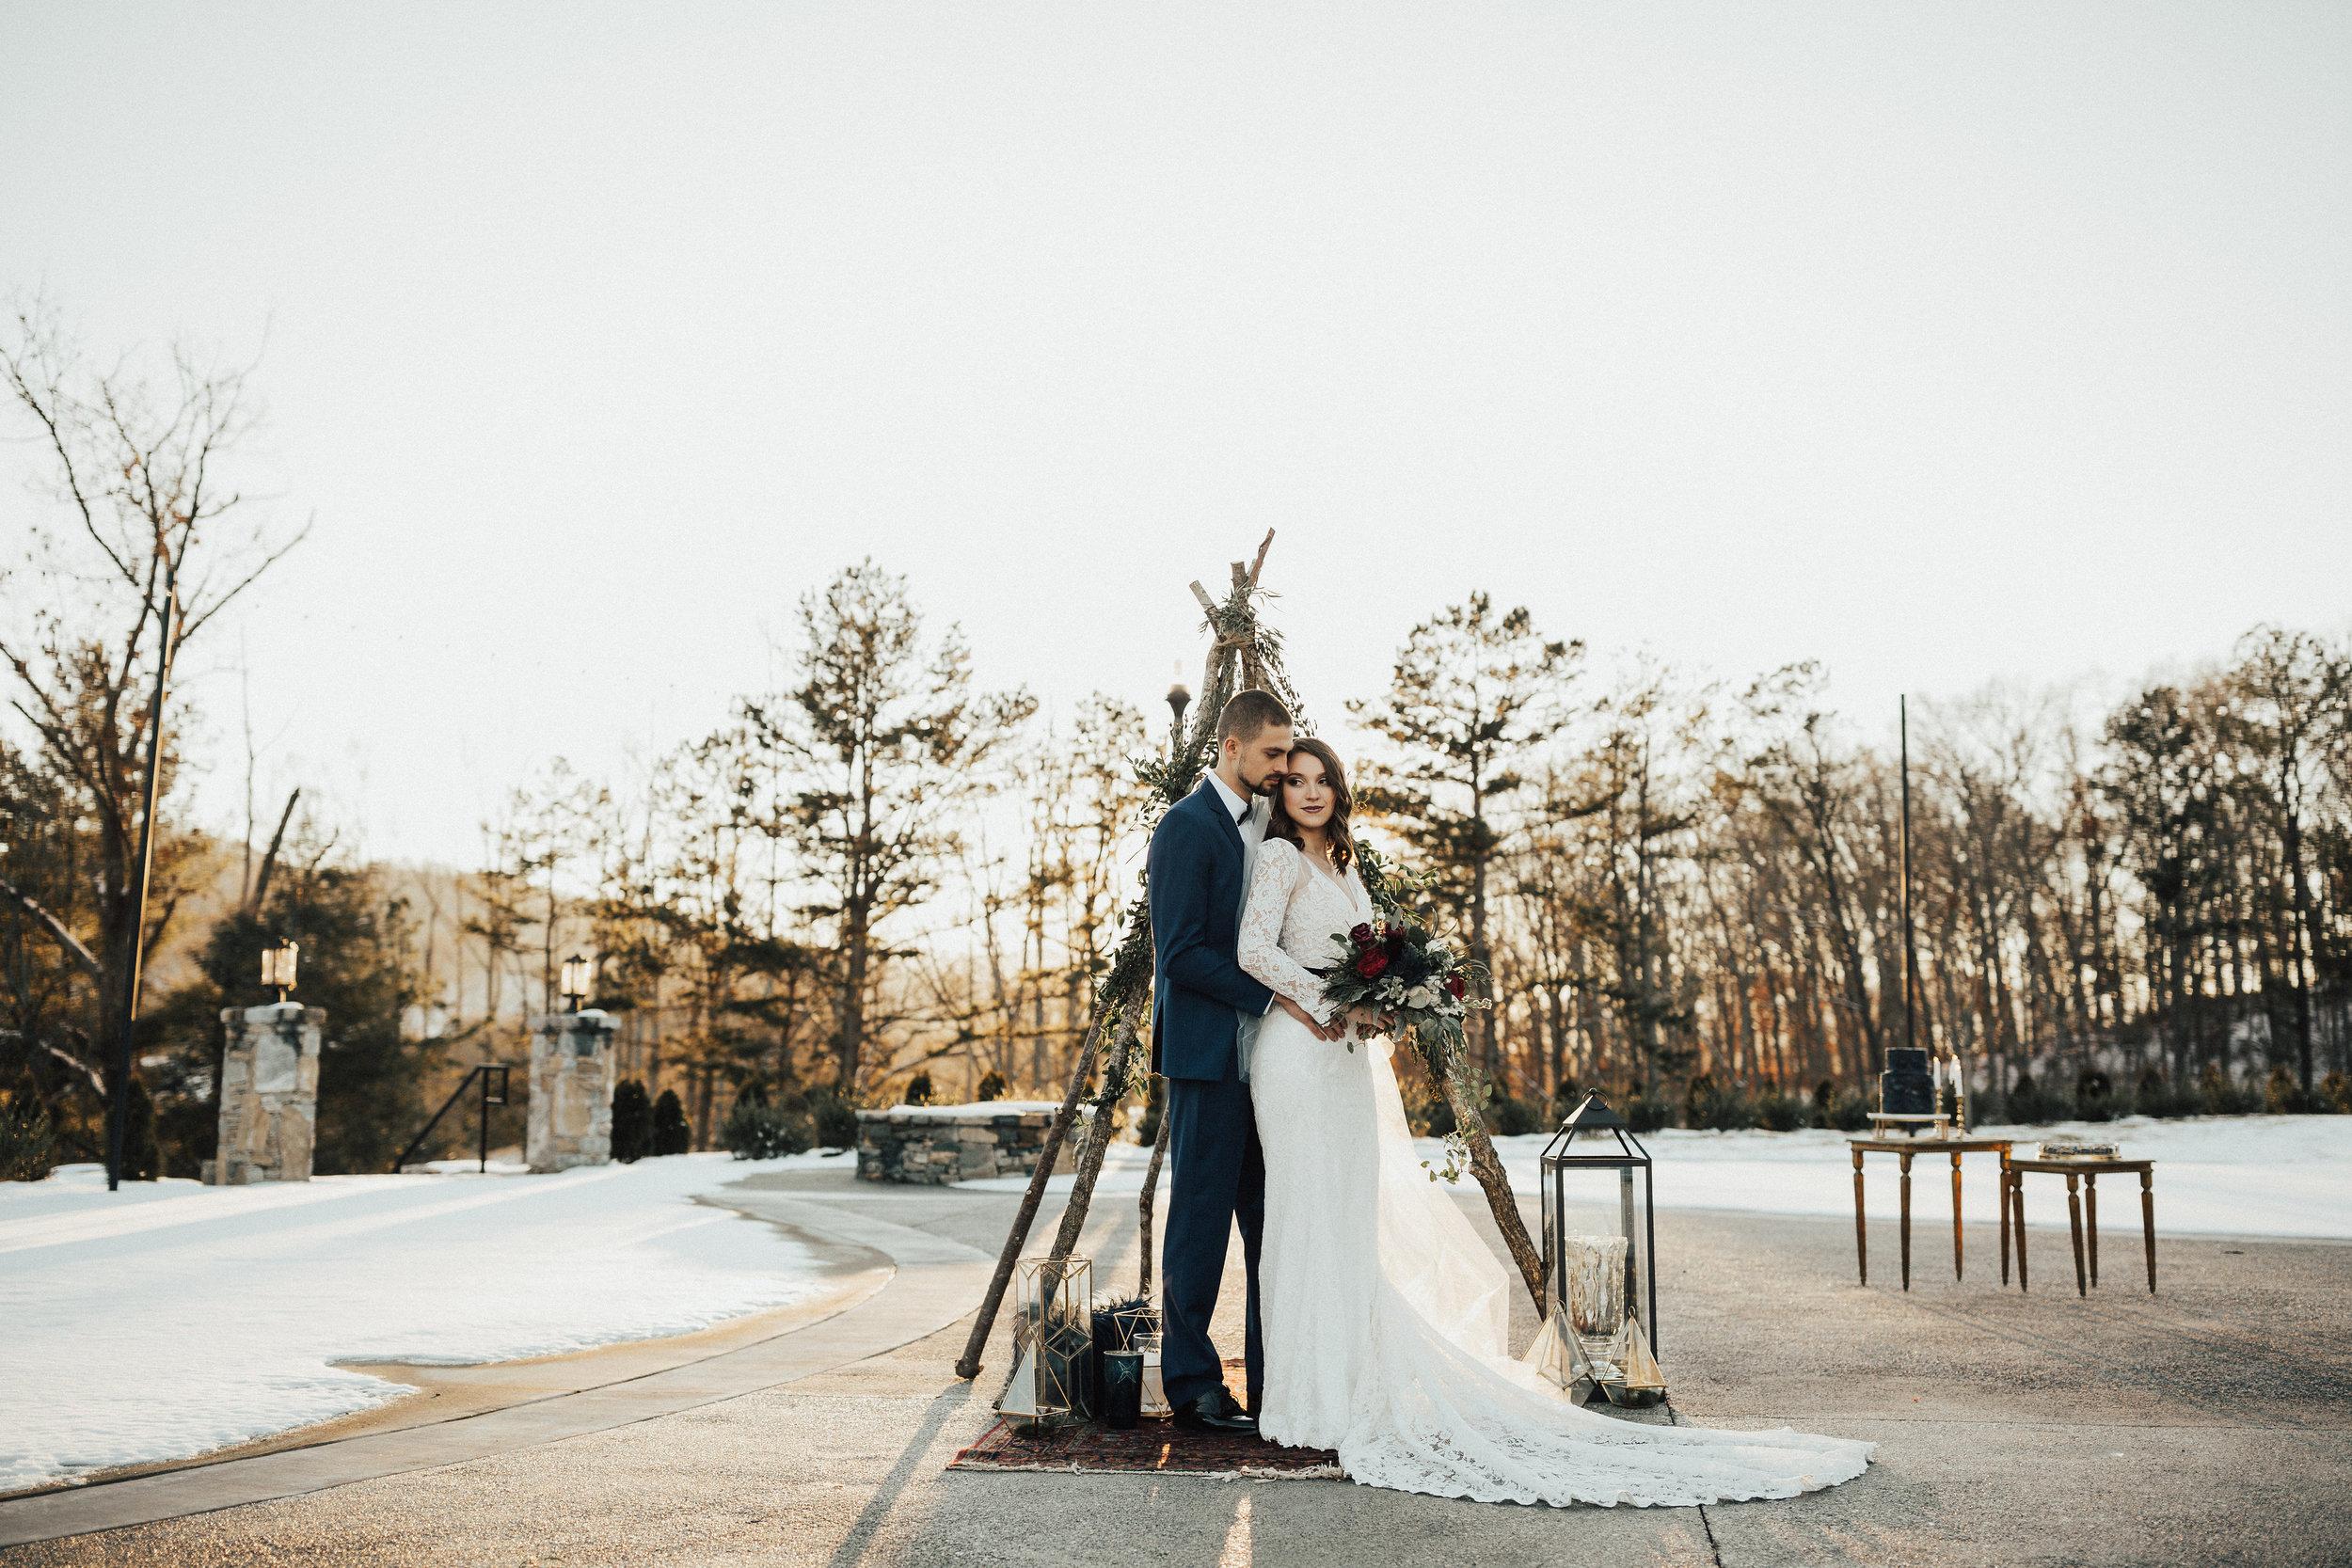 Joy-Unscripted-Wedding-Styled-Shoot-Celestial-Winter-83.jpg